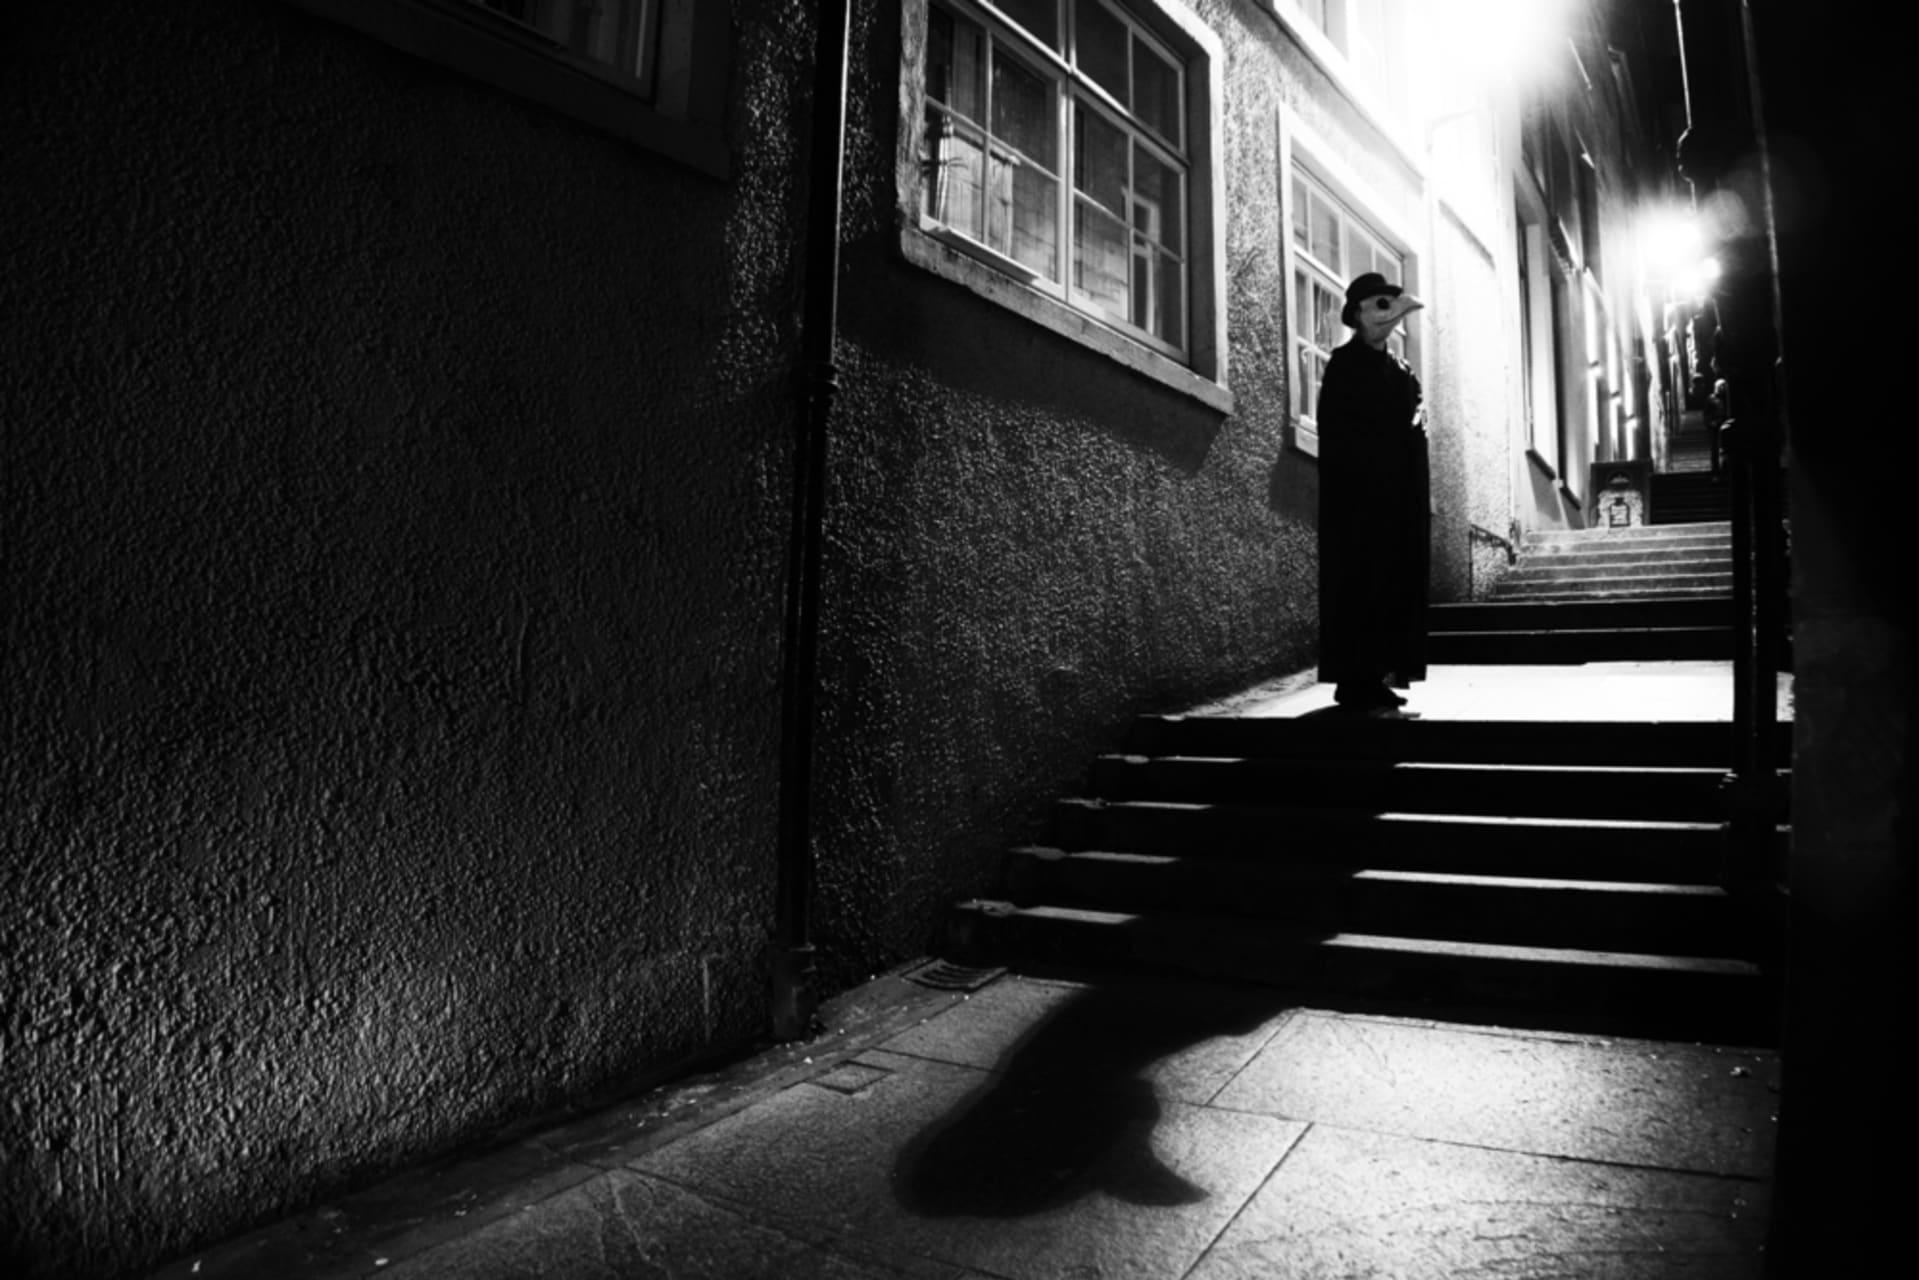 Edinburgh - Haunting Edinburgh, Tales from the darker Side - Part 1